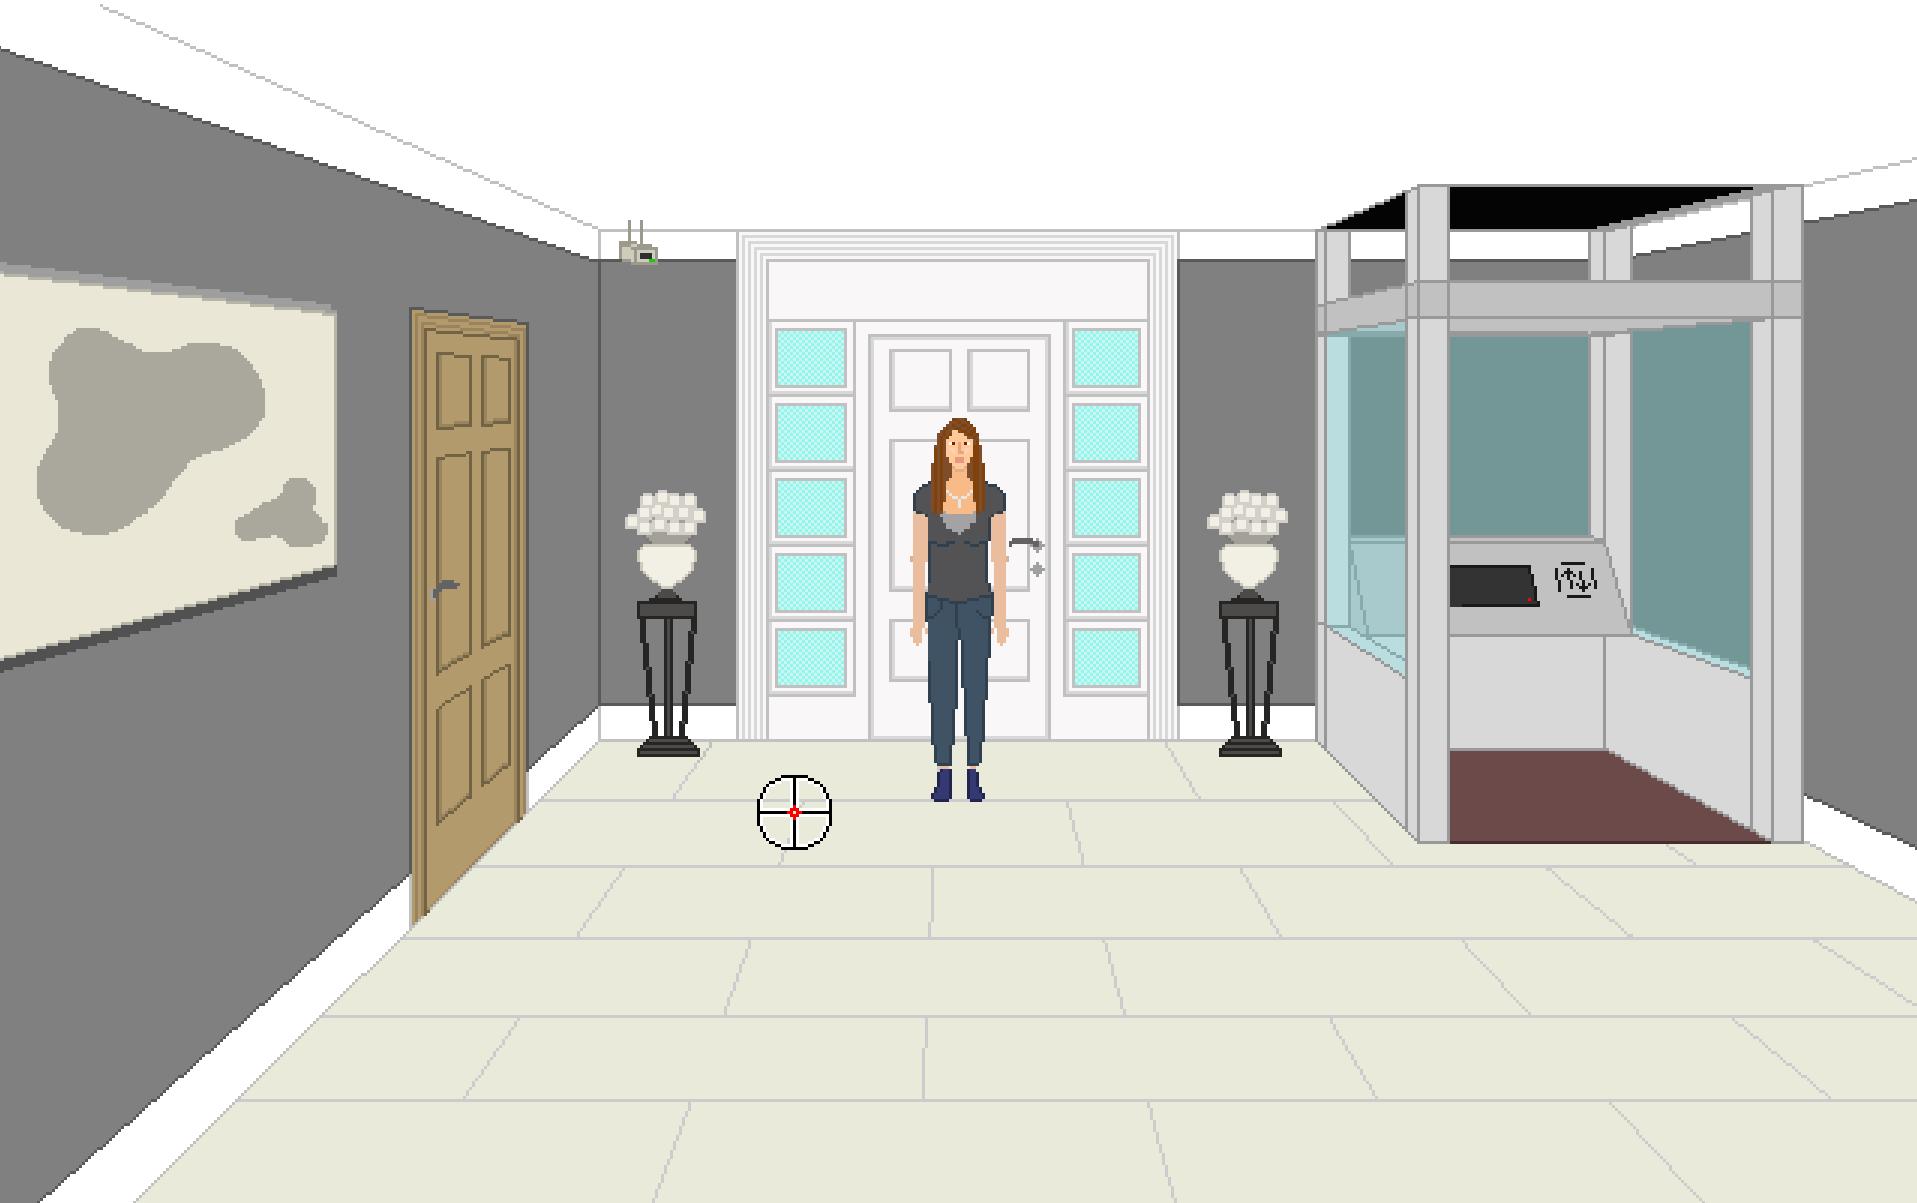 Screenshot 3 of The Penthouse width=